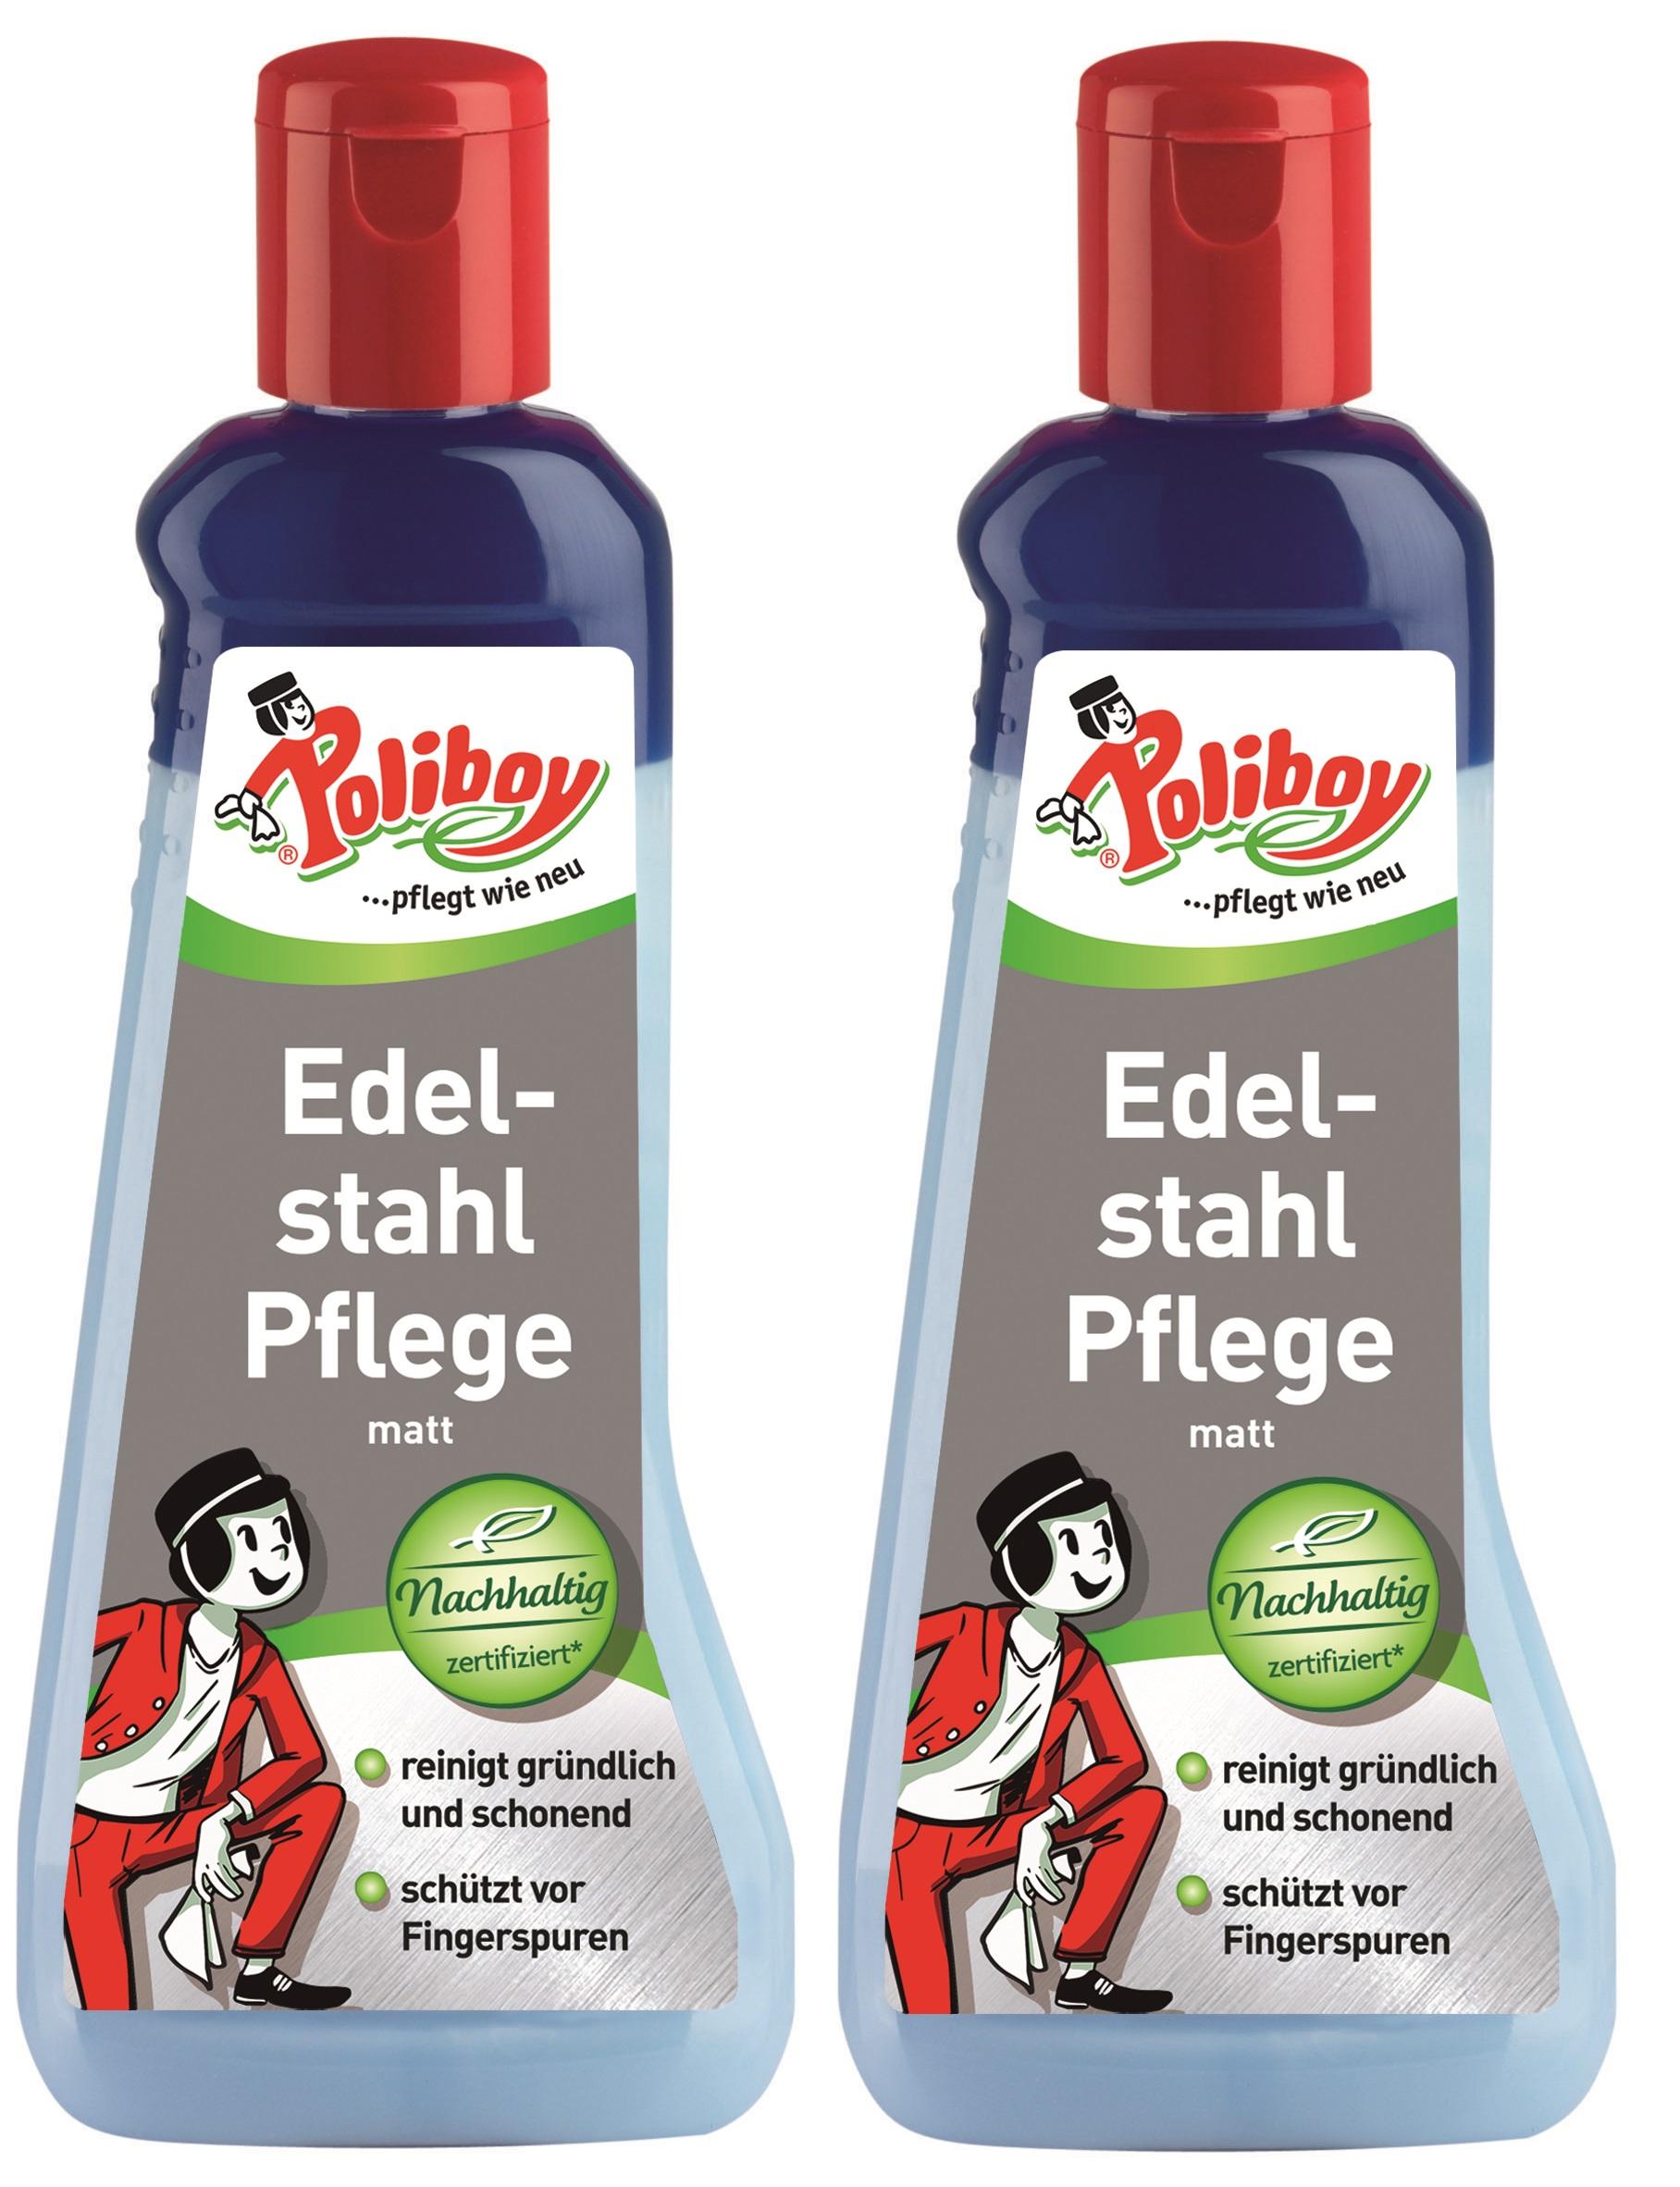 Poliboy - Edelstahl Pflege, matt 2x200 ml - für Aluminium oder Edelstahl